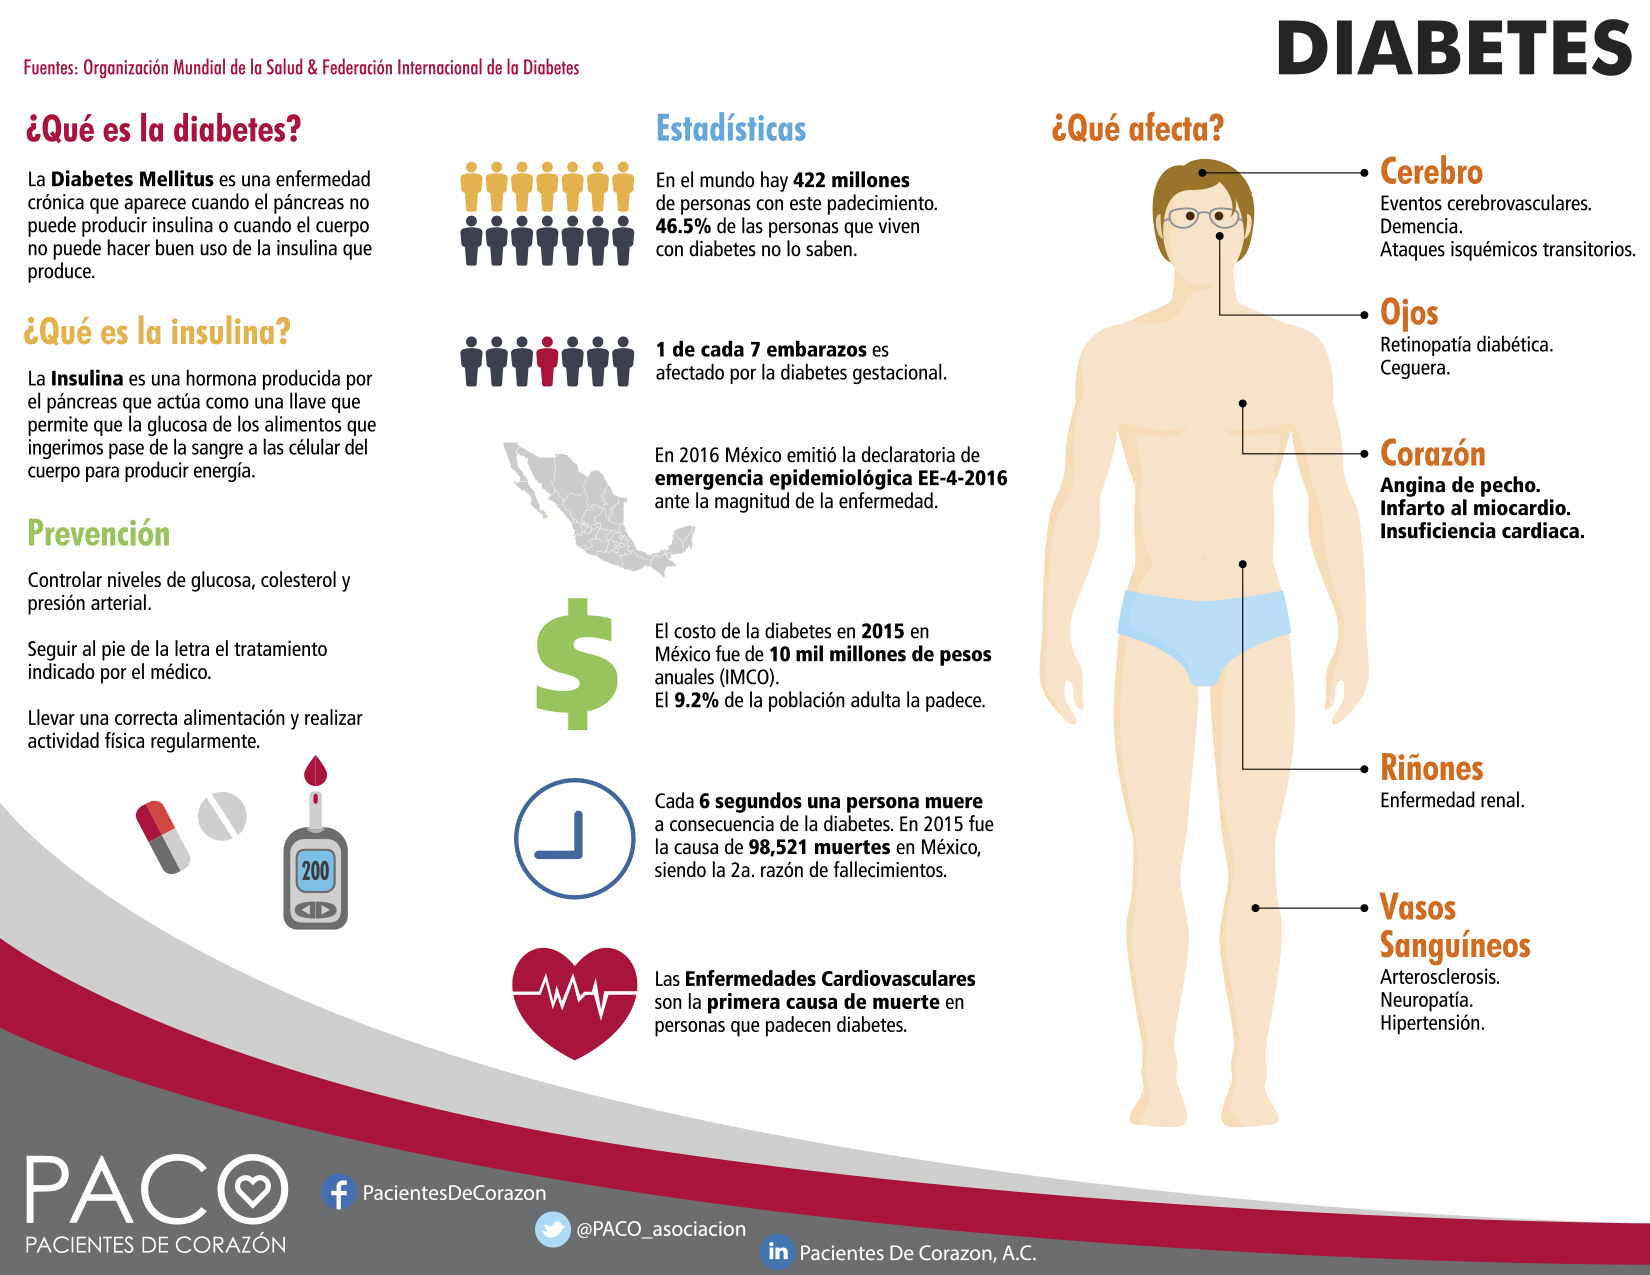 :: Pacientes de Corazón | Diabetes, Factor de Riesgo para